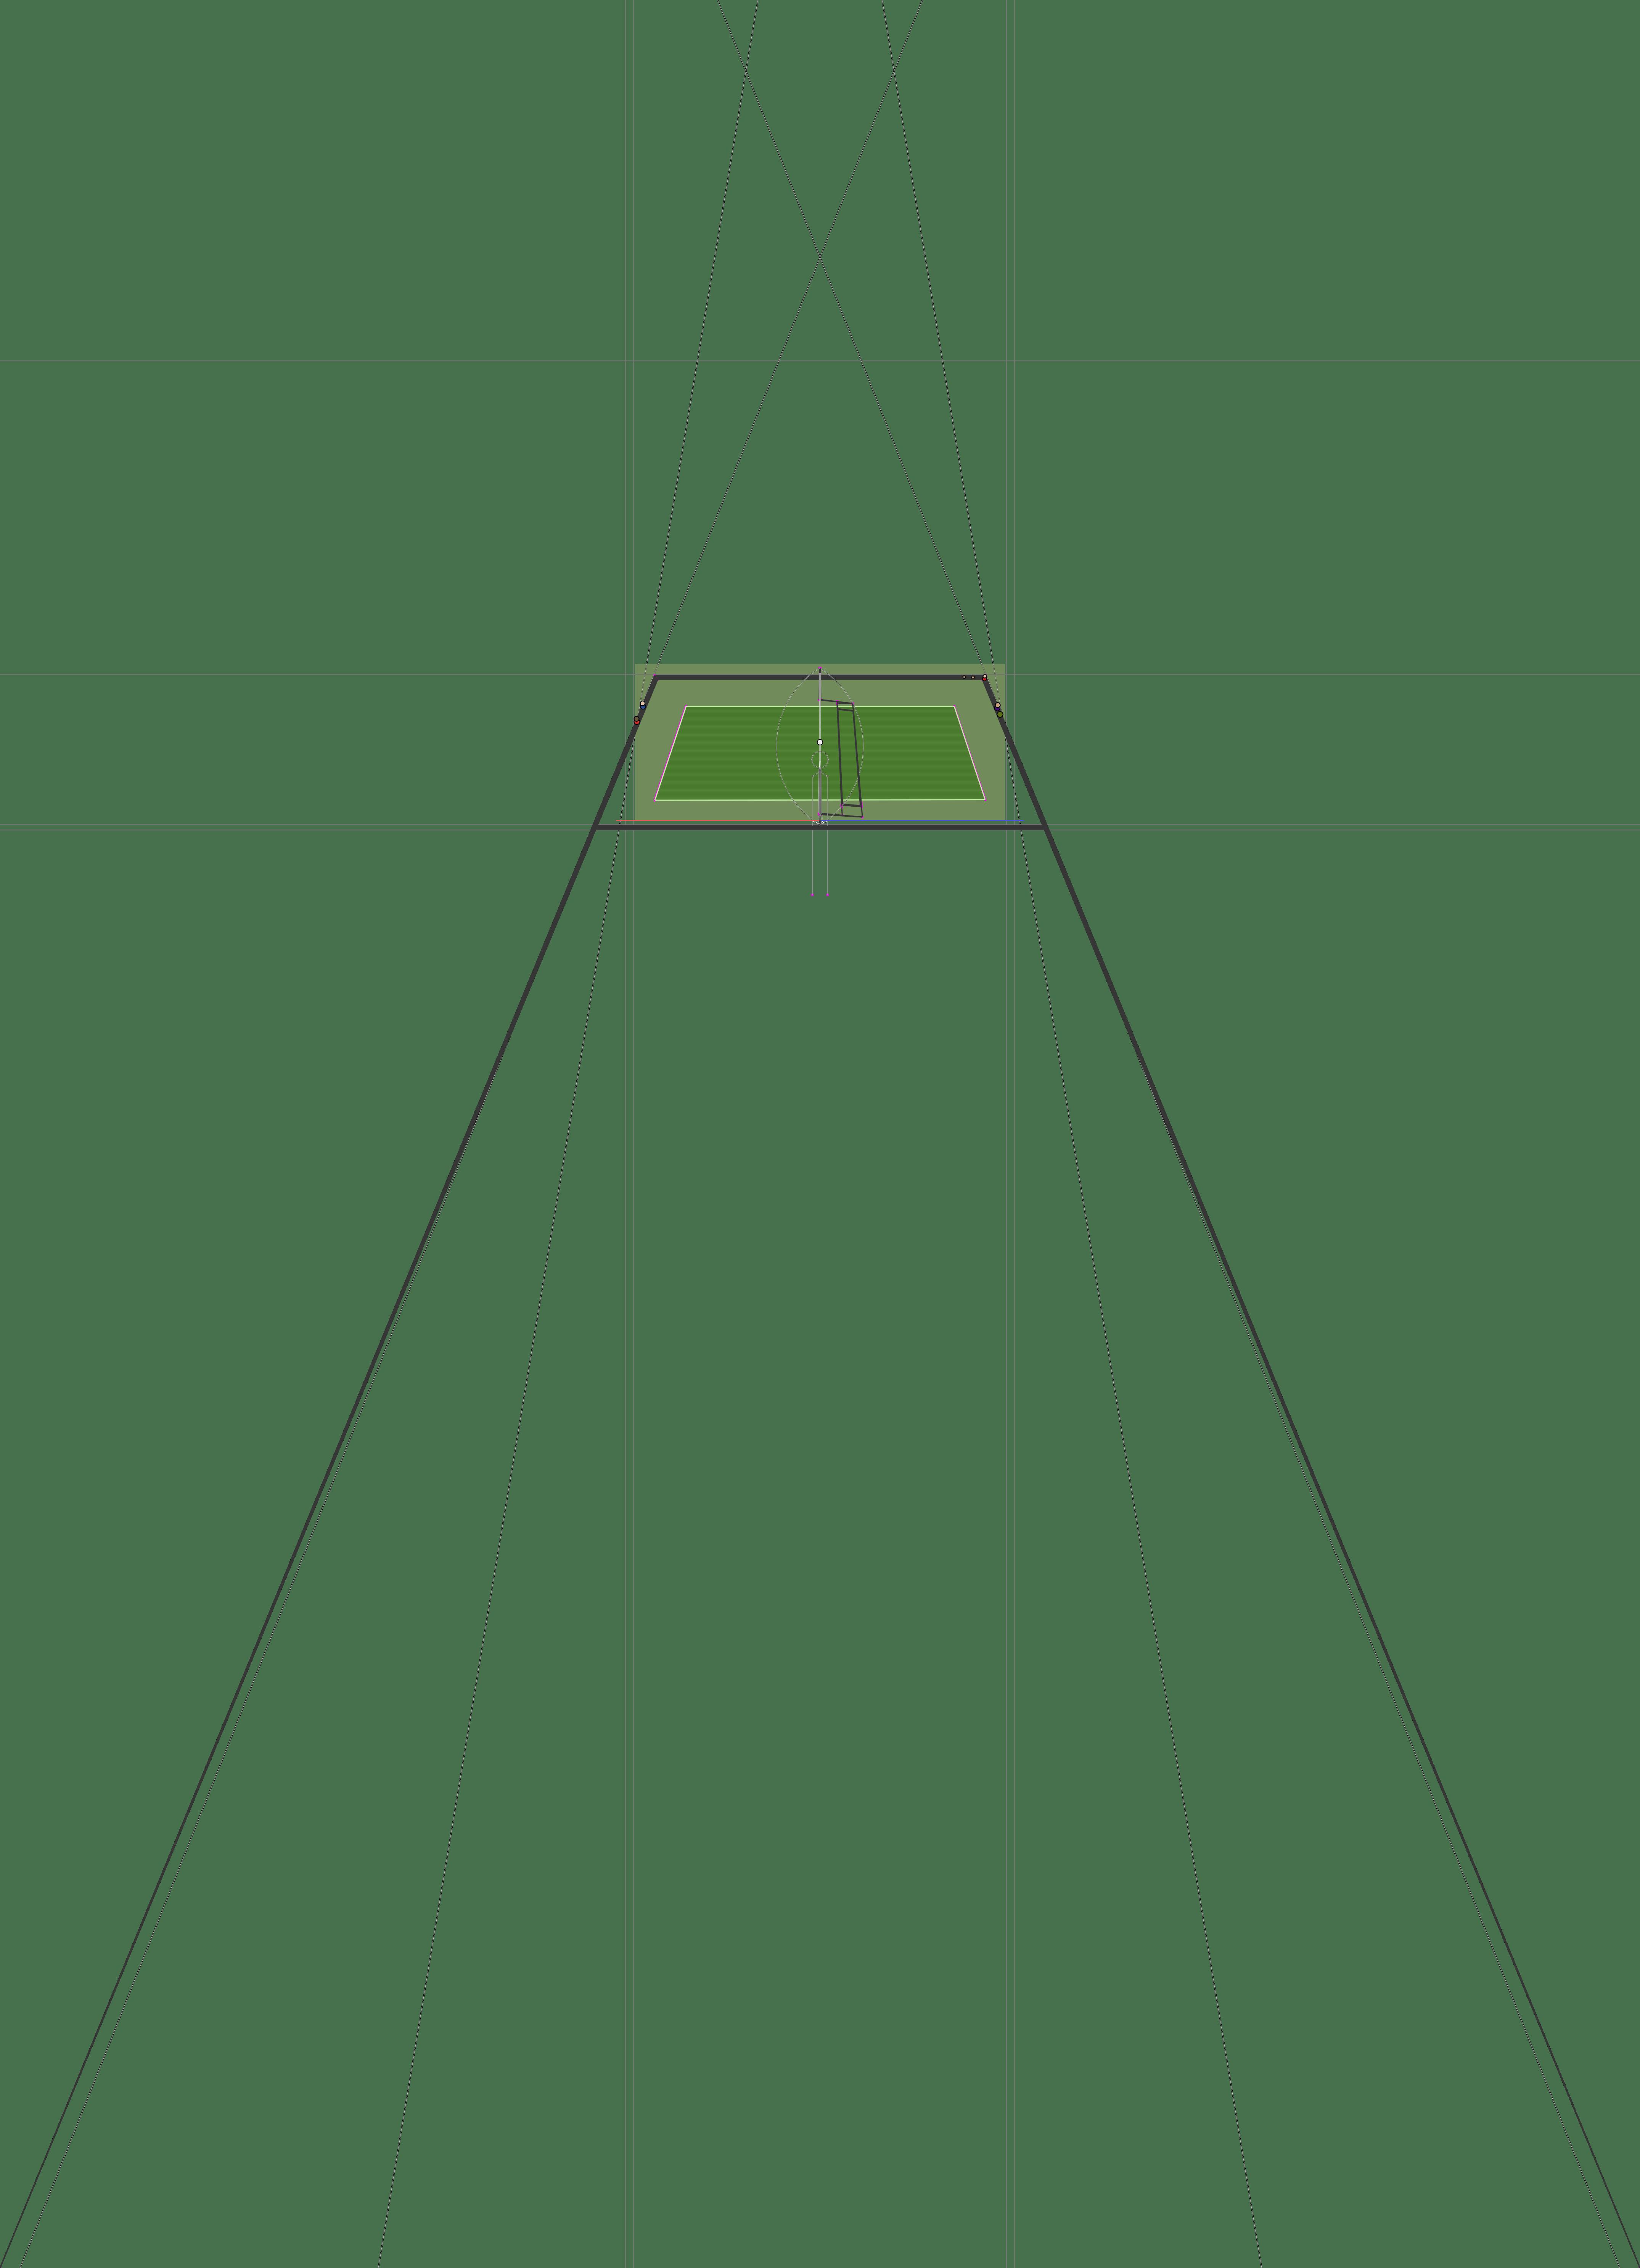 hax ball maps | Badminton 3D